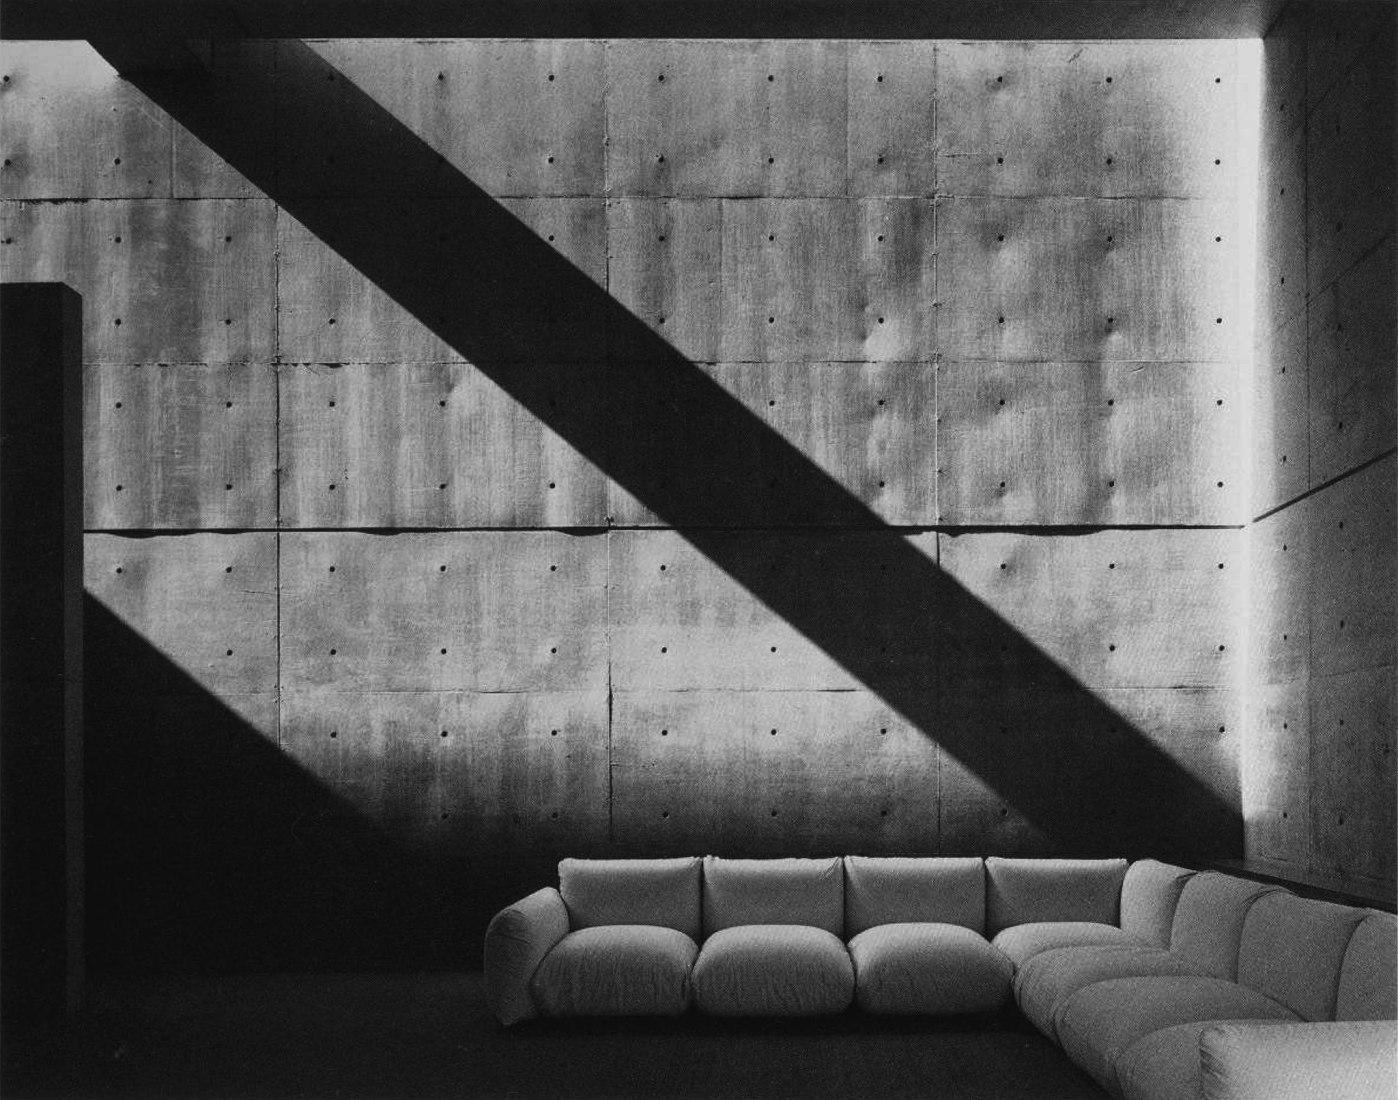 Casa Koshino por Tadao Ando. Imagen cortesía de The Museum of Modern Art.